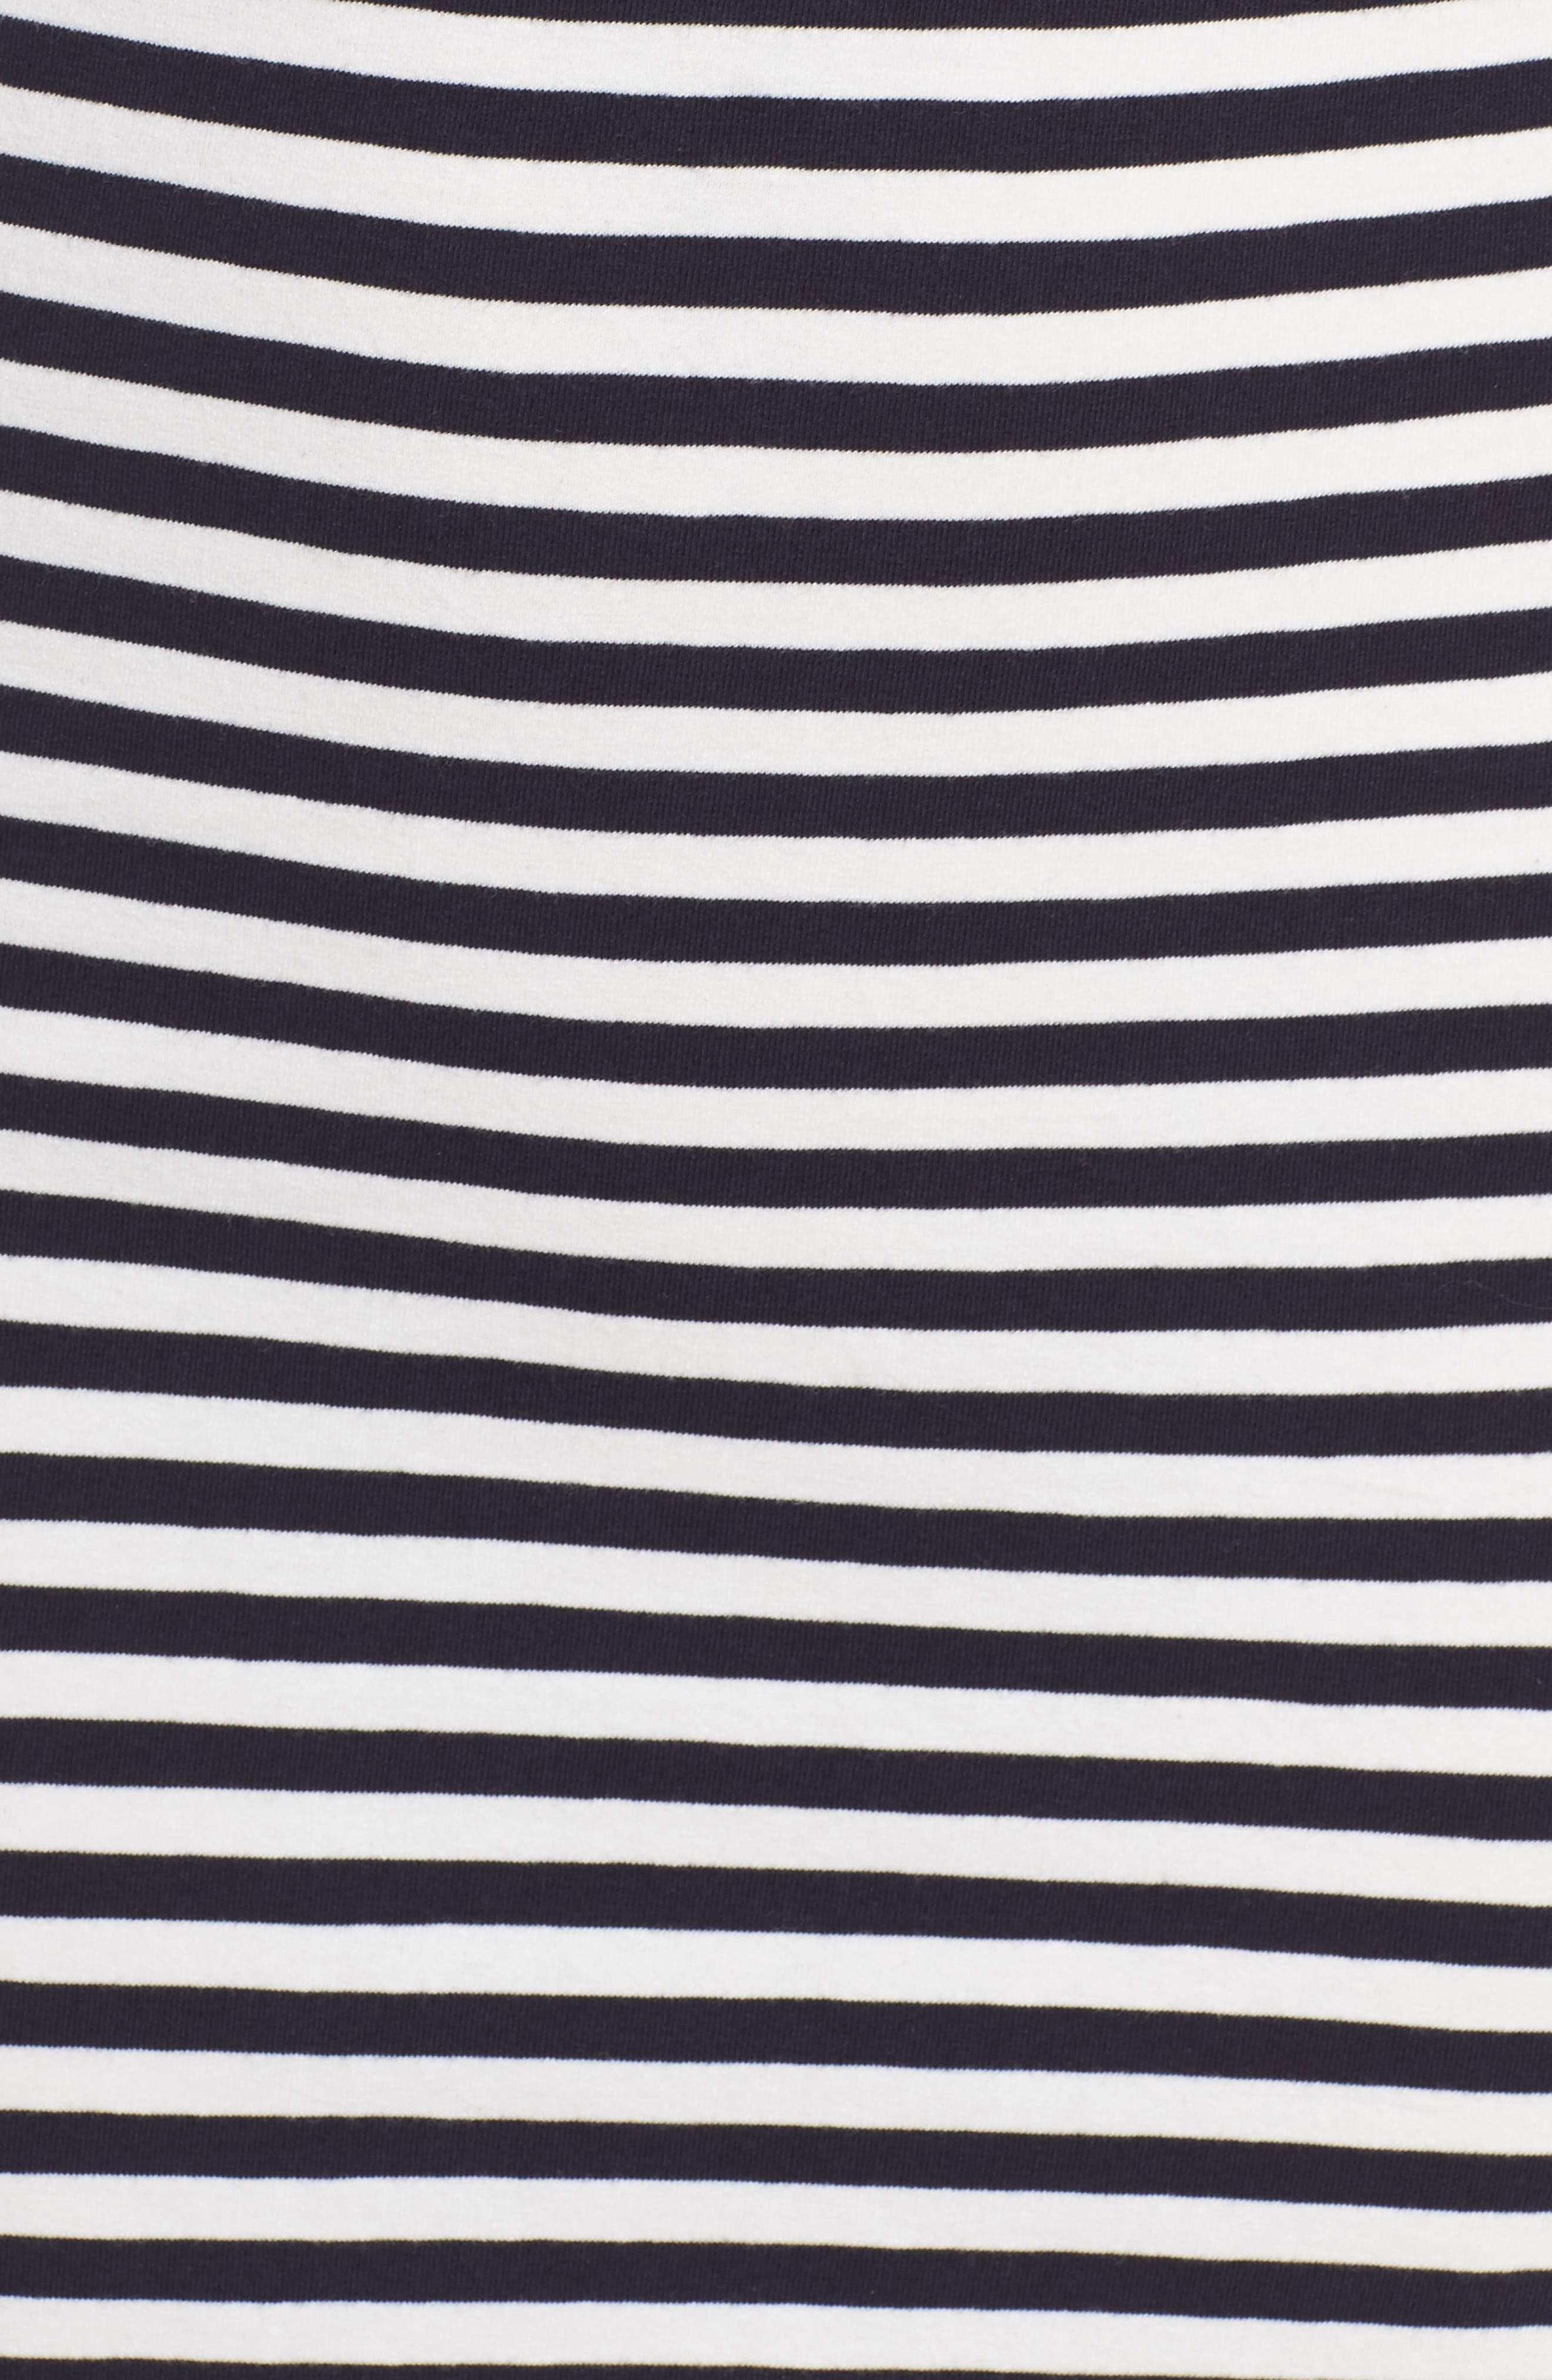 Sienna Knit Dress,                             Alternate thumbnail 5, color,                             493